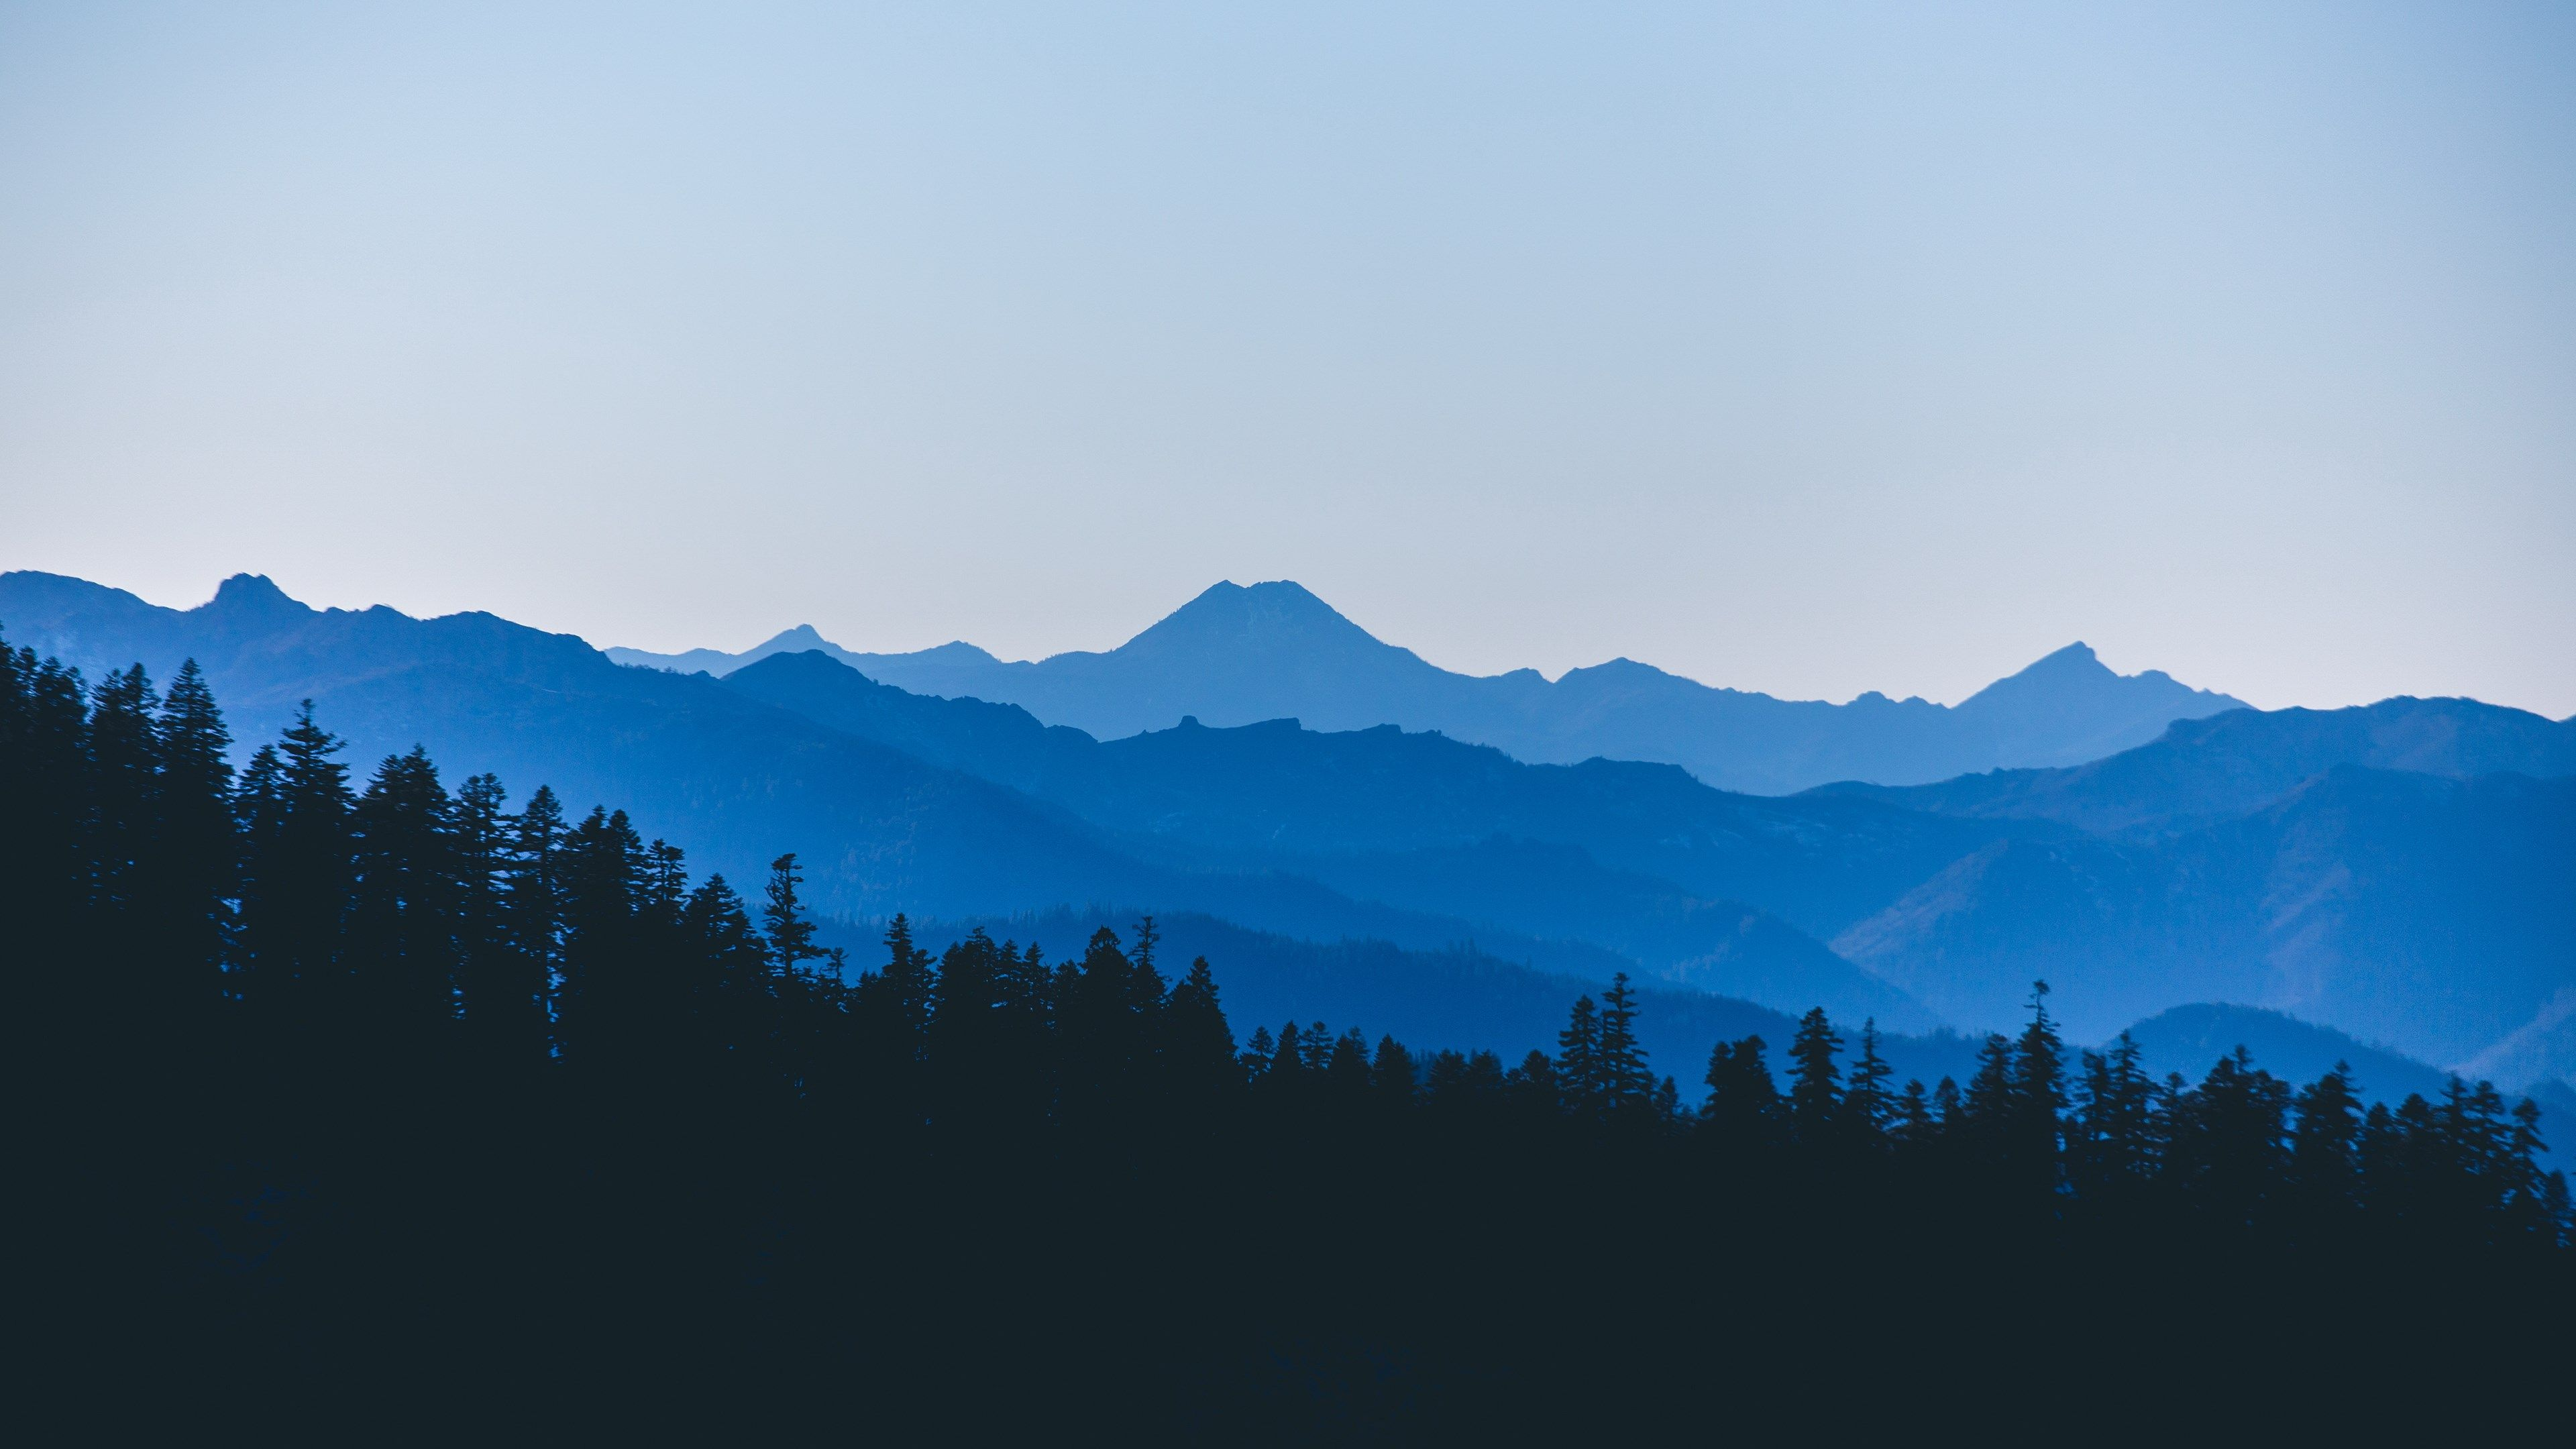 Most Inspiring Wallpaper Mountain Dark - f887320b498963dad4bf188205ffaae5  Pic_846048.jpg